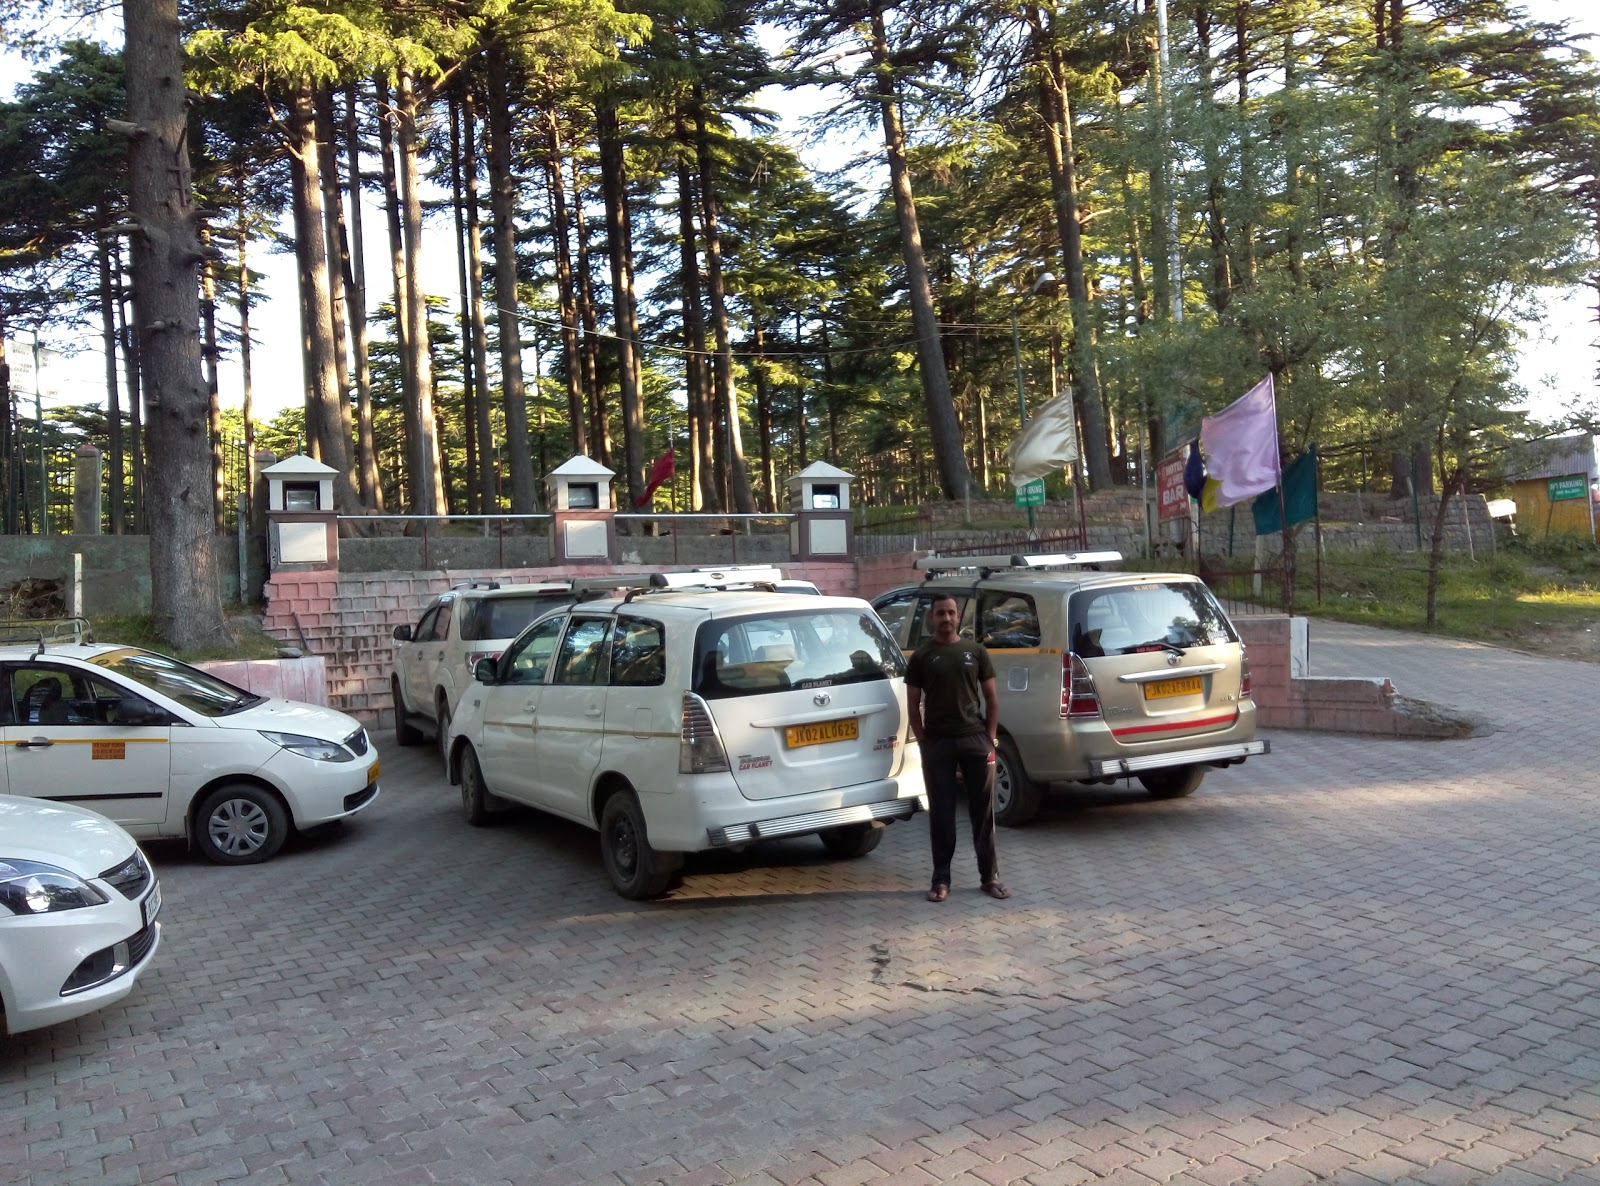 Hotel Jai Skahan Patnitop Jammu Division India Around Guides